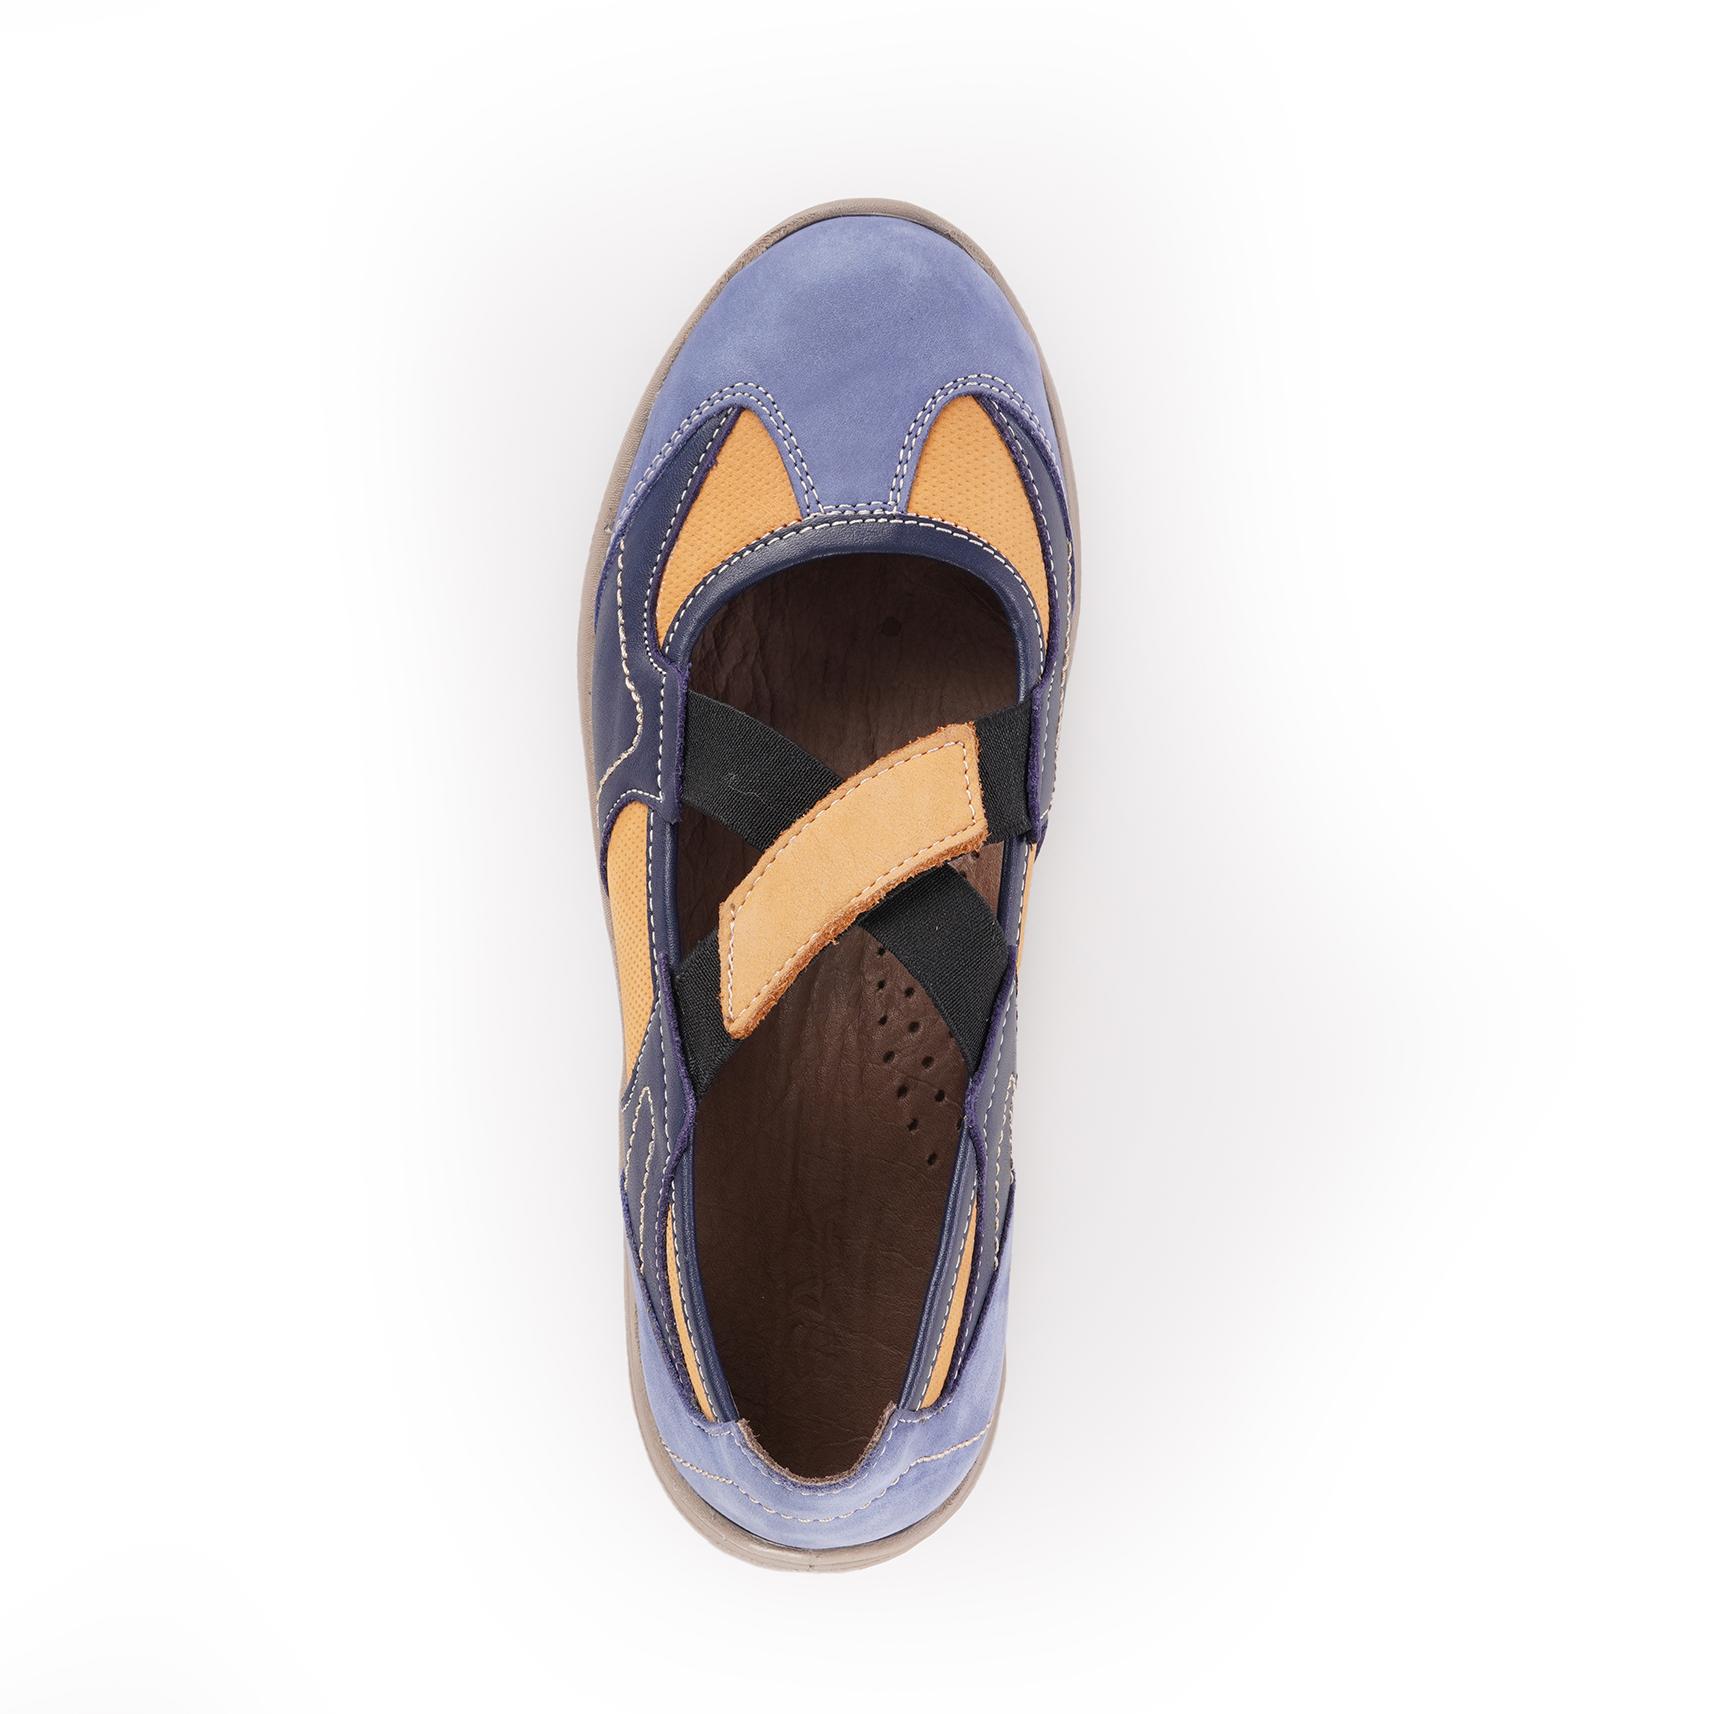 کفش روزمره زنانه صاد کد PP2402